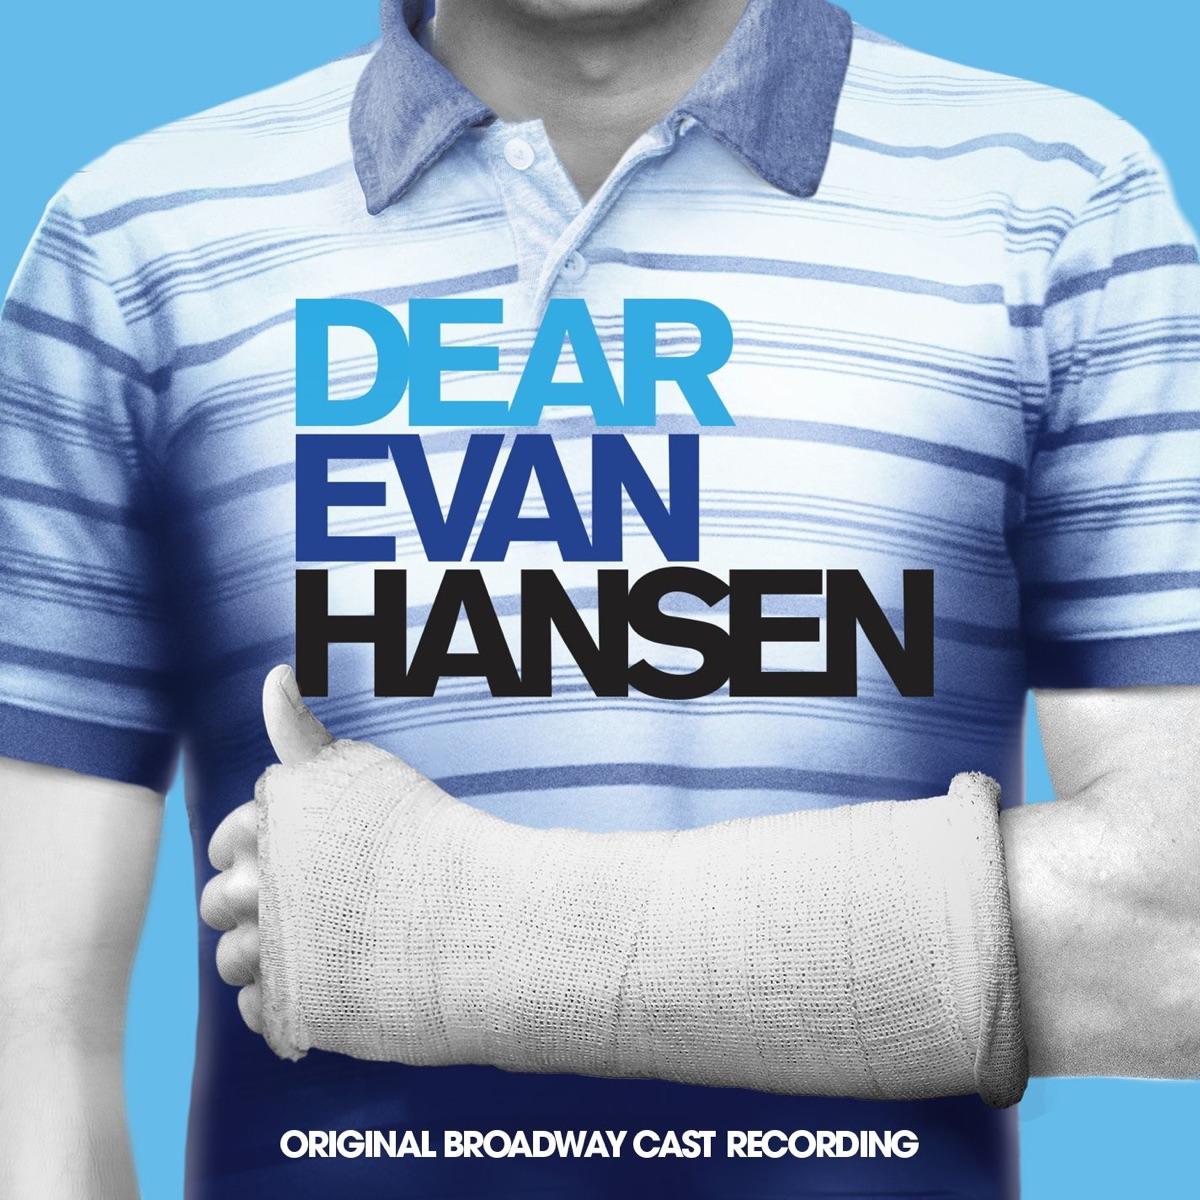 Dear Evan Hansen Original Broadway Cast Recording Various Artists CD cover